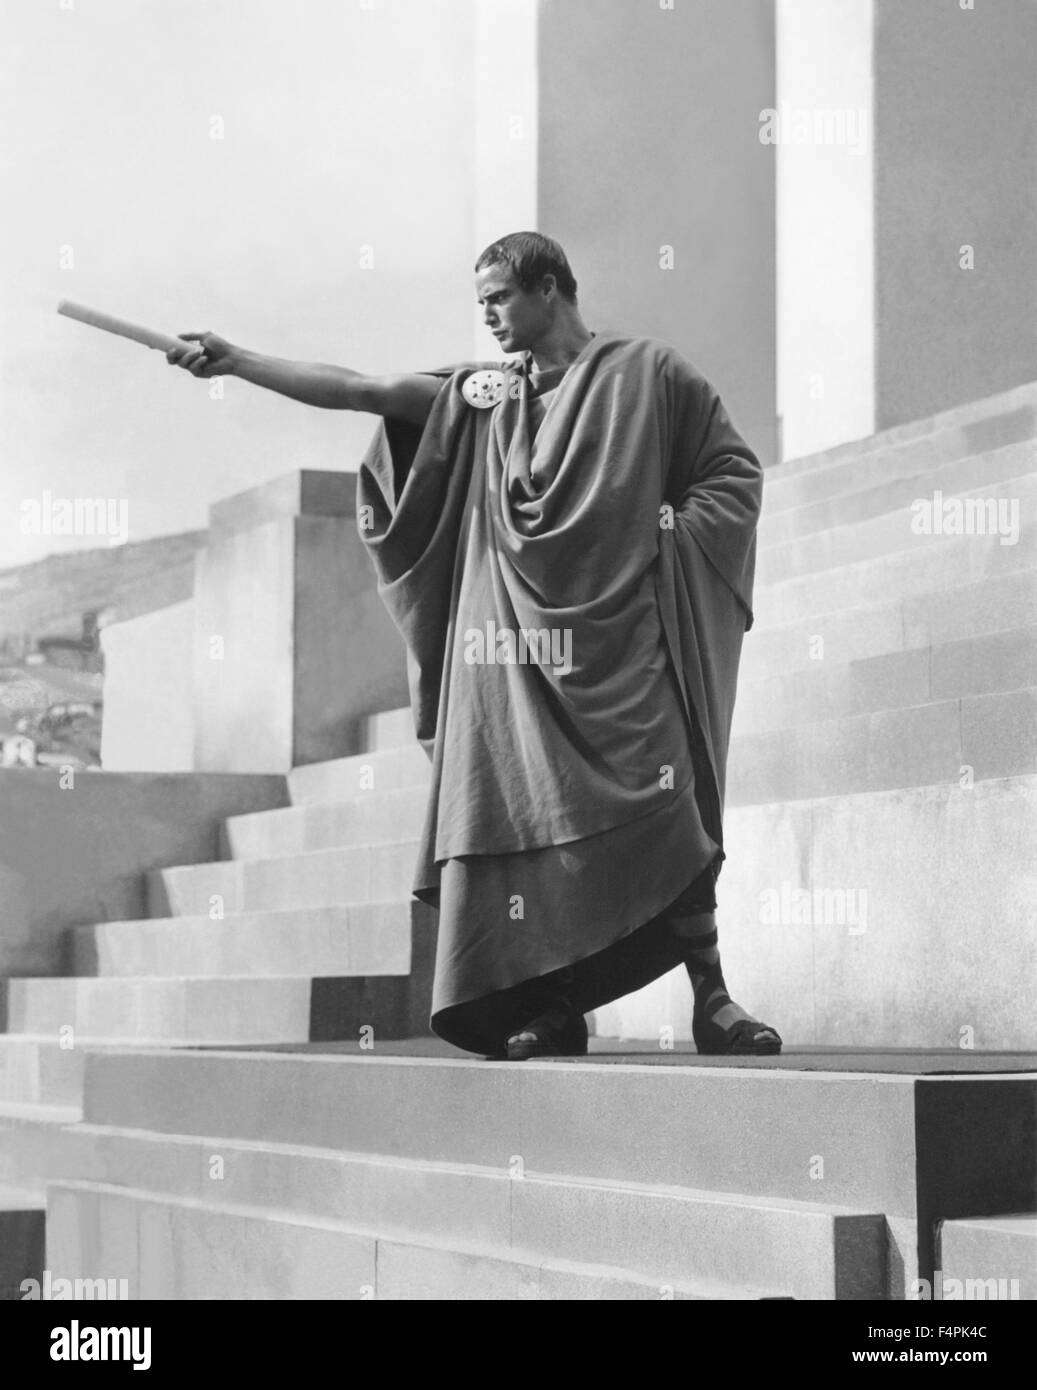 Marlon Brando / Julius Caesar / 1953 directed by Joseph L. Mankiewicz  [Metro-Goldwyn-Mayer Pictures] - Stock Image